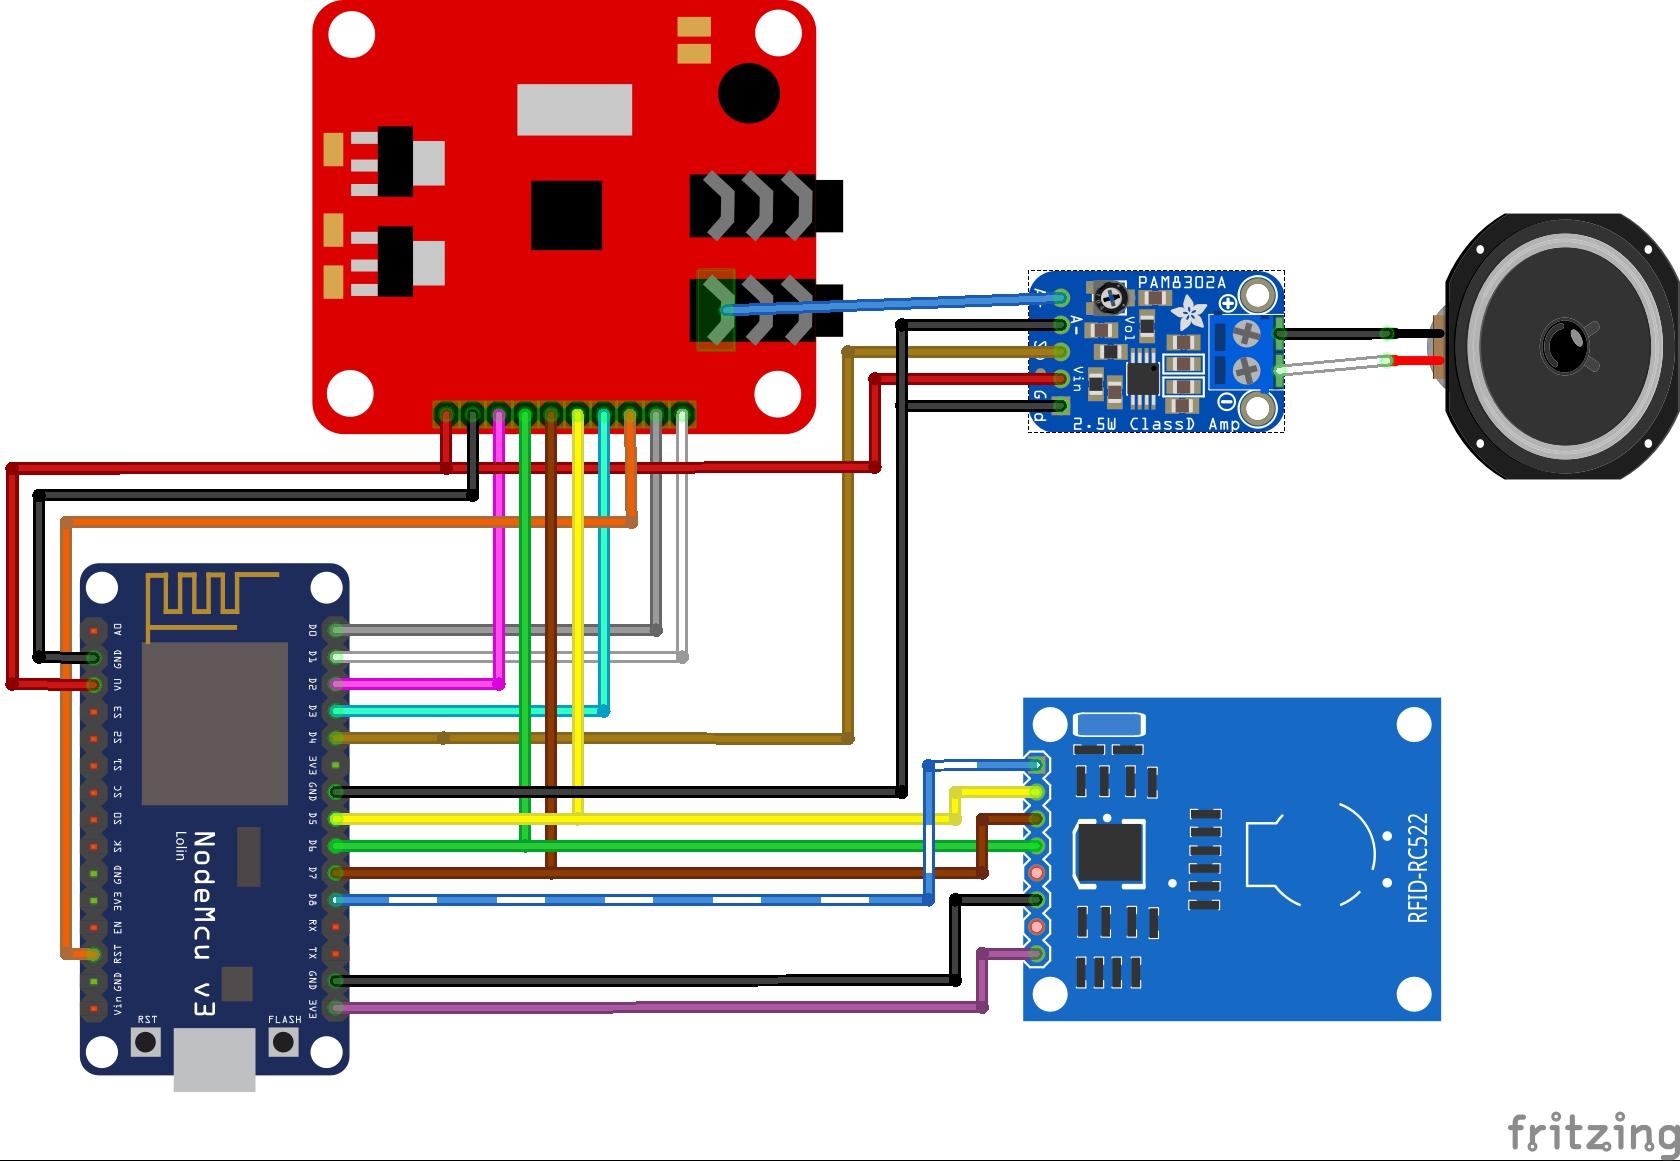 images/wiring.jpg